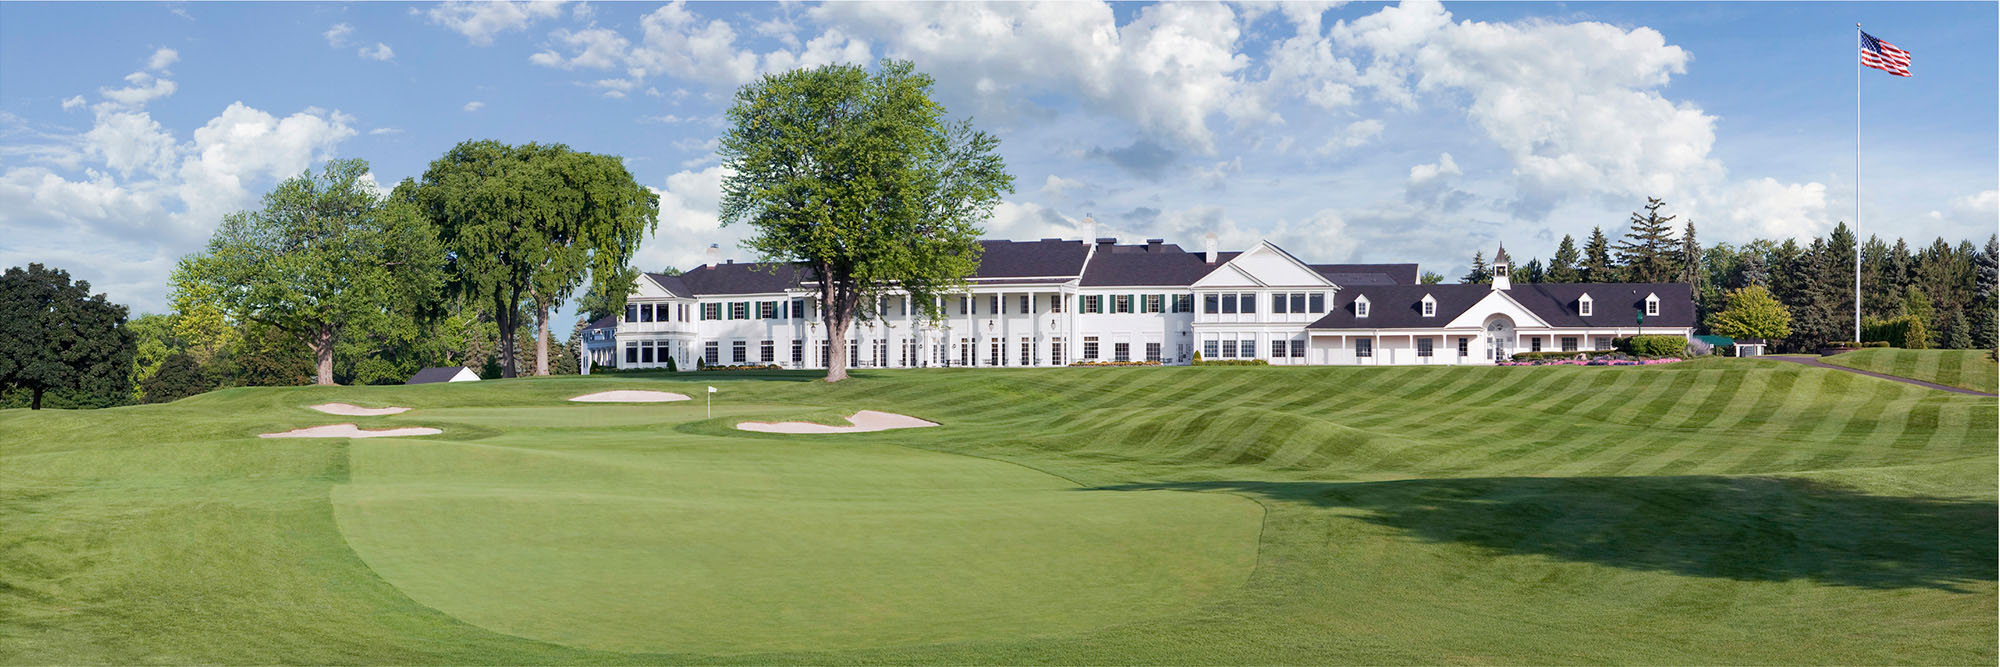 Golf Course Image - Oakland Hills No. 9